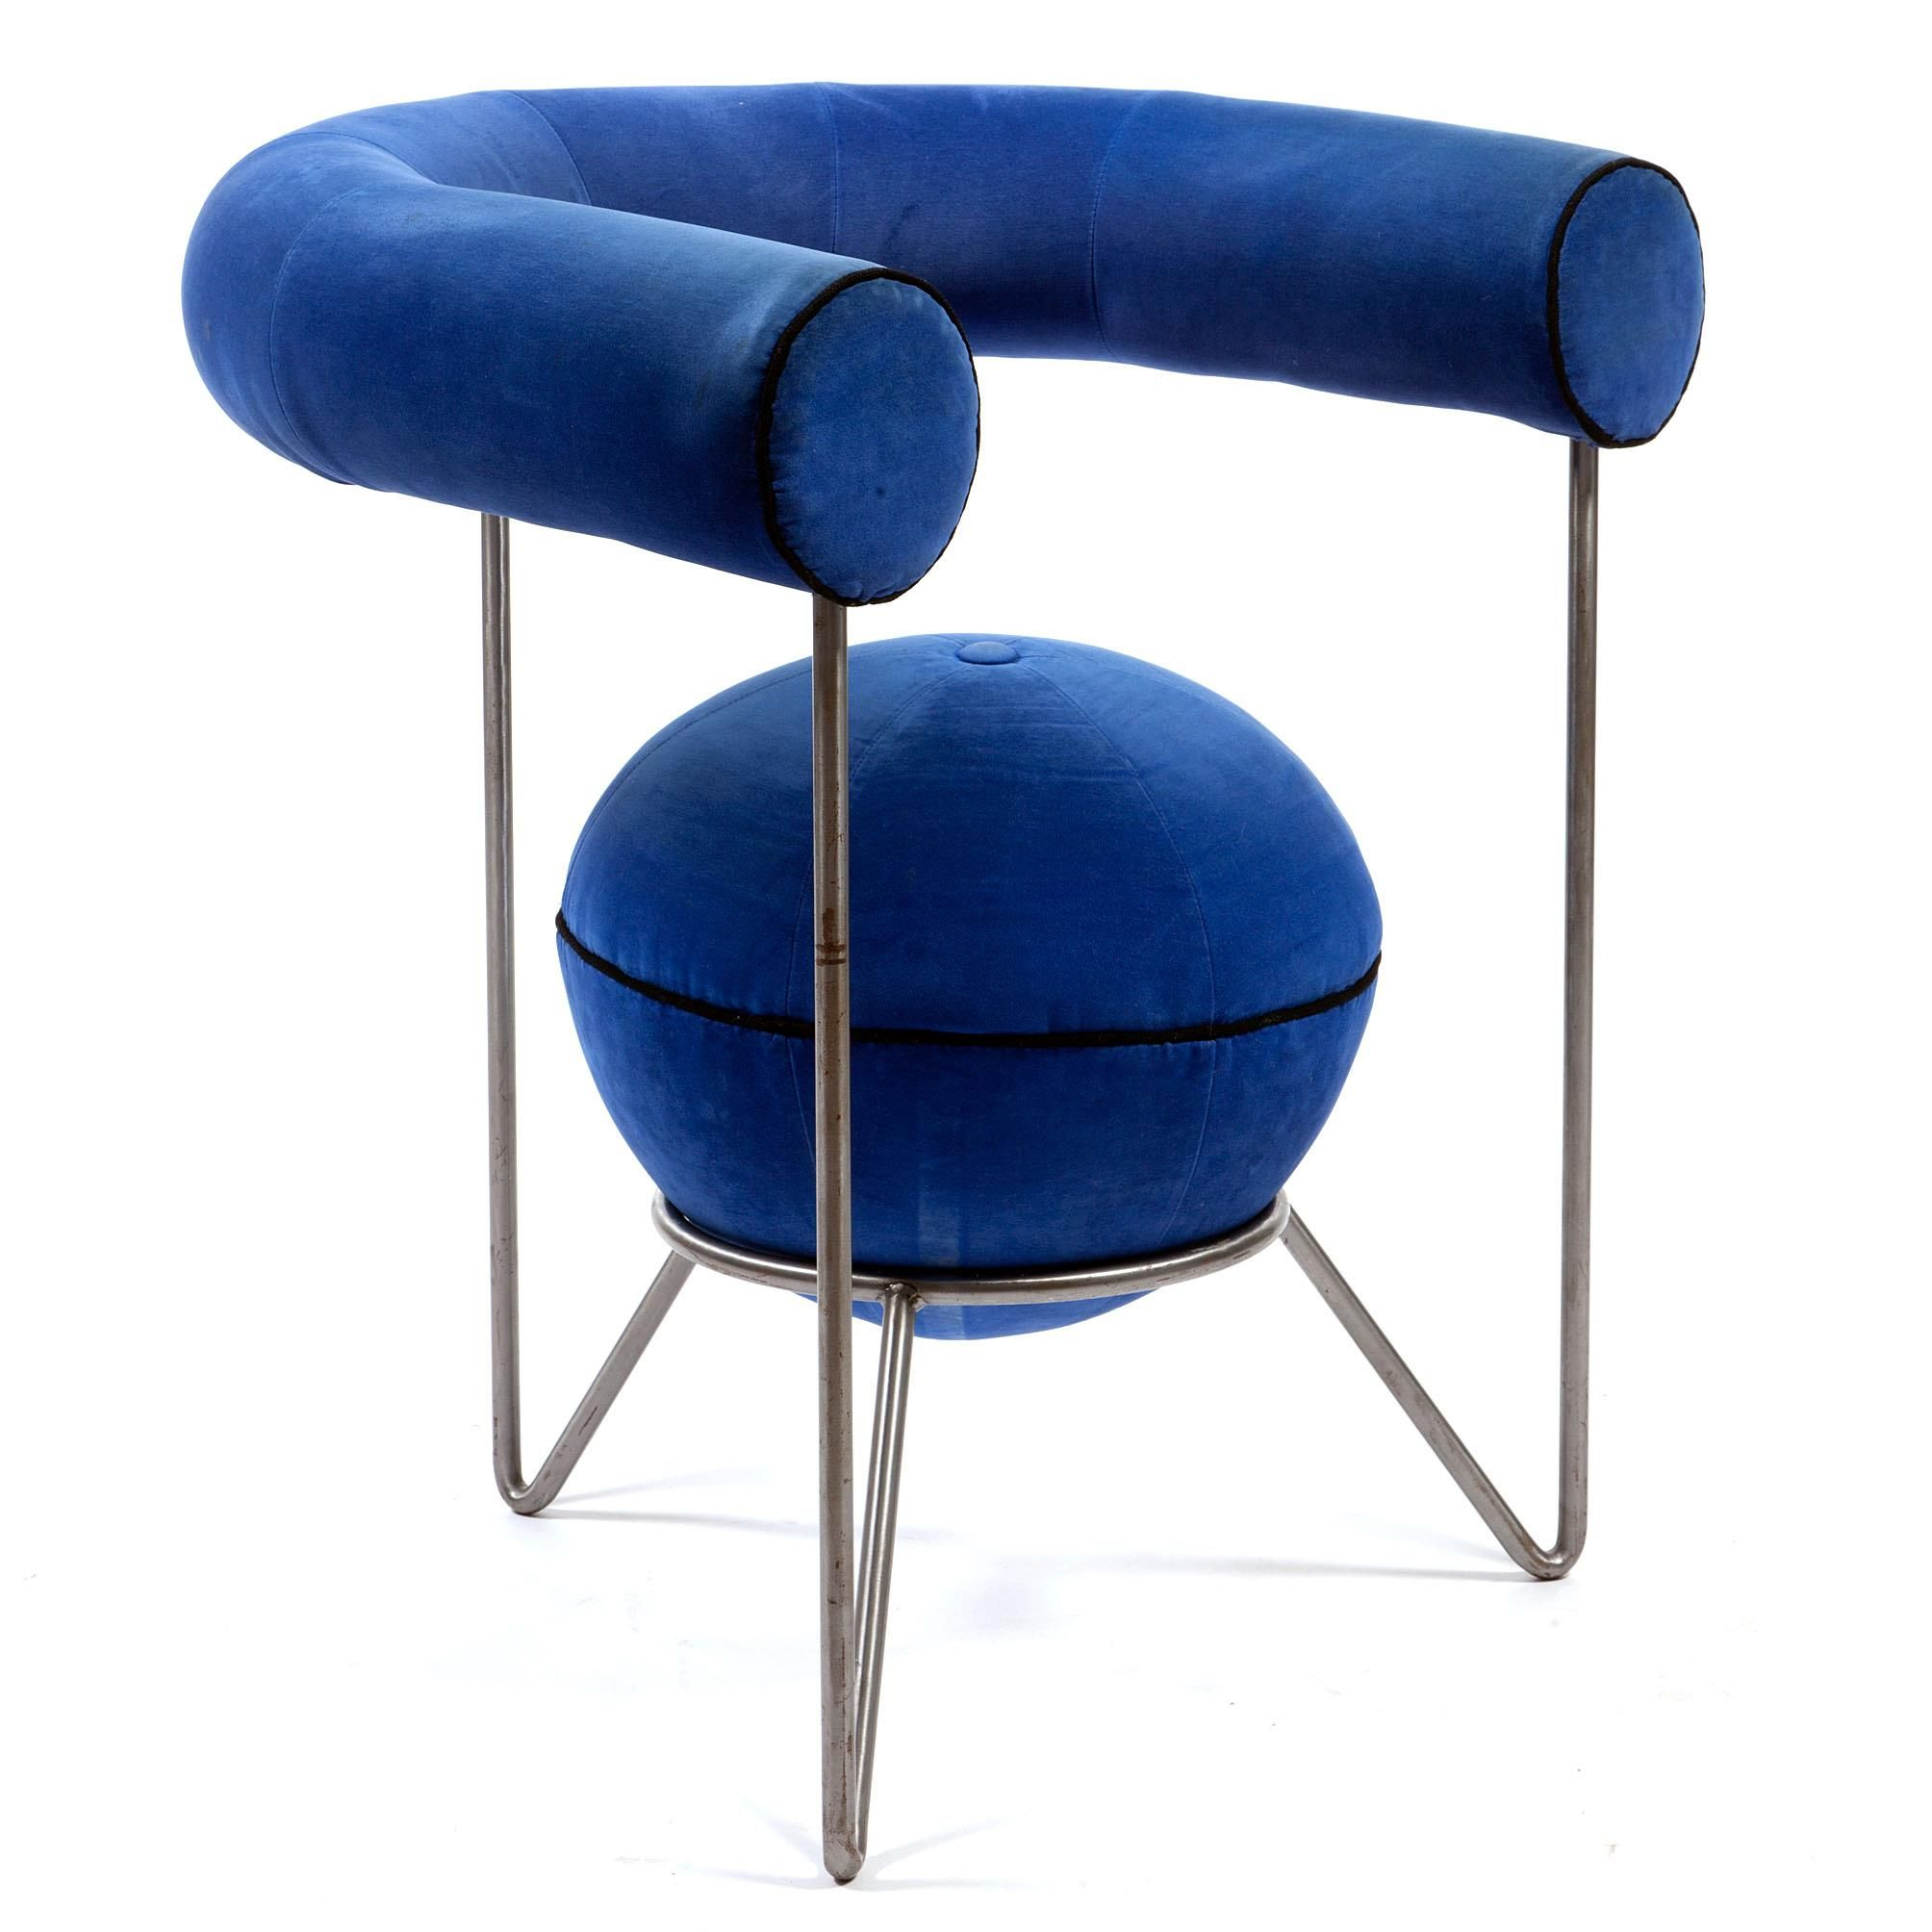 Royal Blue Contemporary Armchair Design Rik Tuithof Atlas 1992  # Muebles Tubulares Ponce